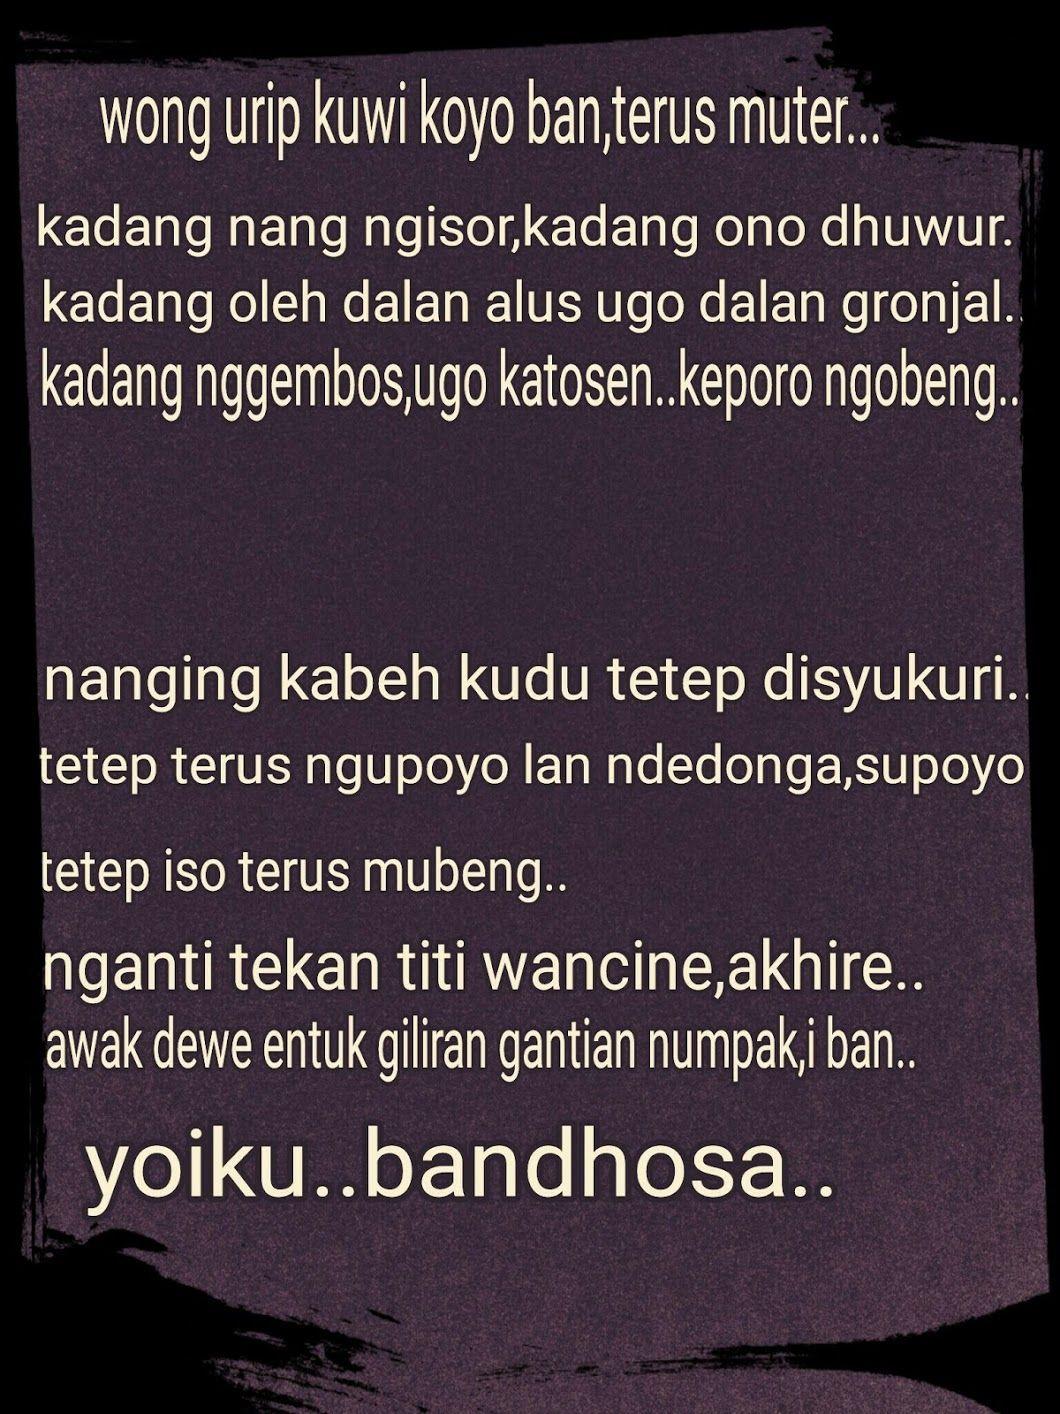 Kata Kata Cemburu Bahasa Jawa : cemburu, bahasa, Mutiara, Kakatabijak